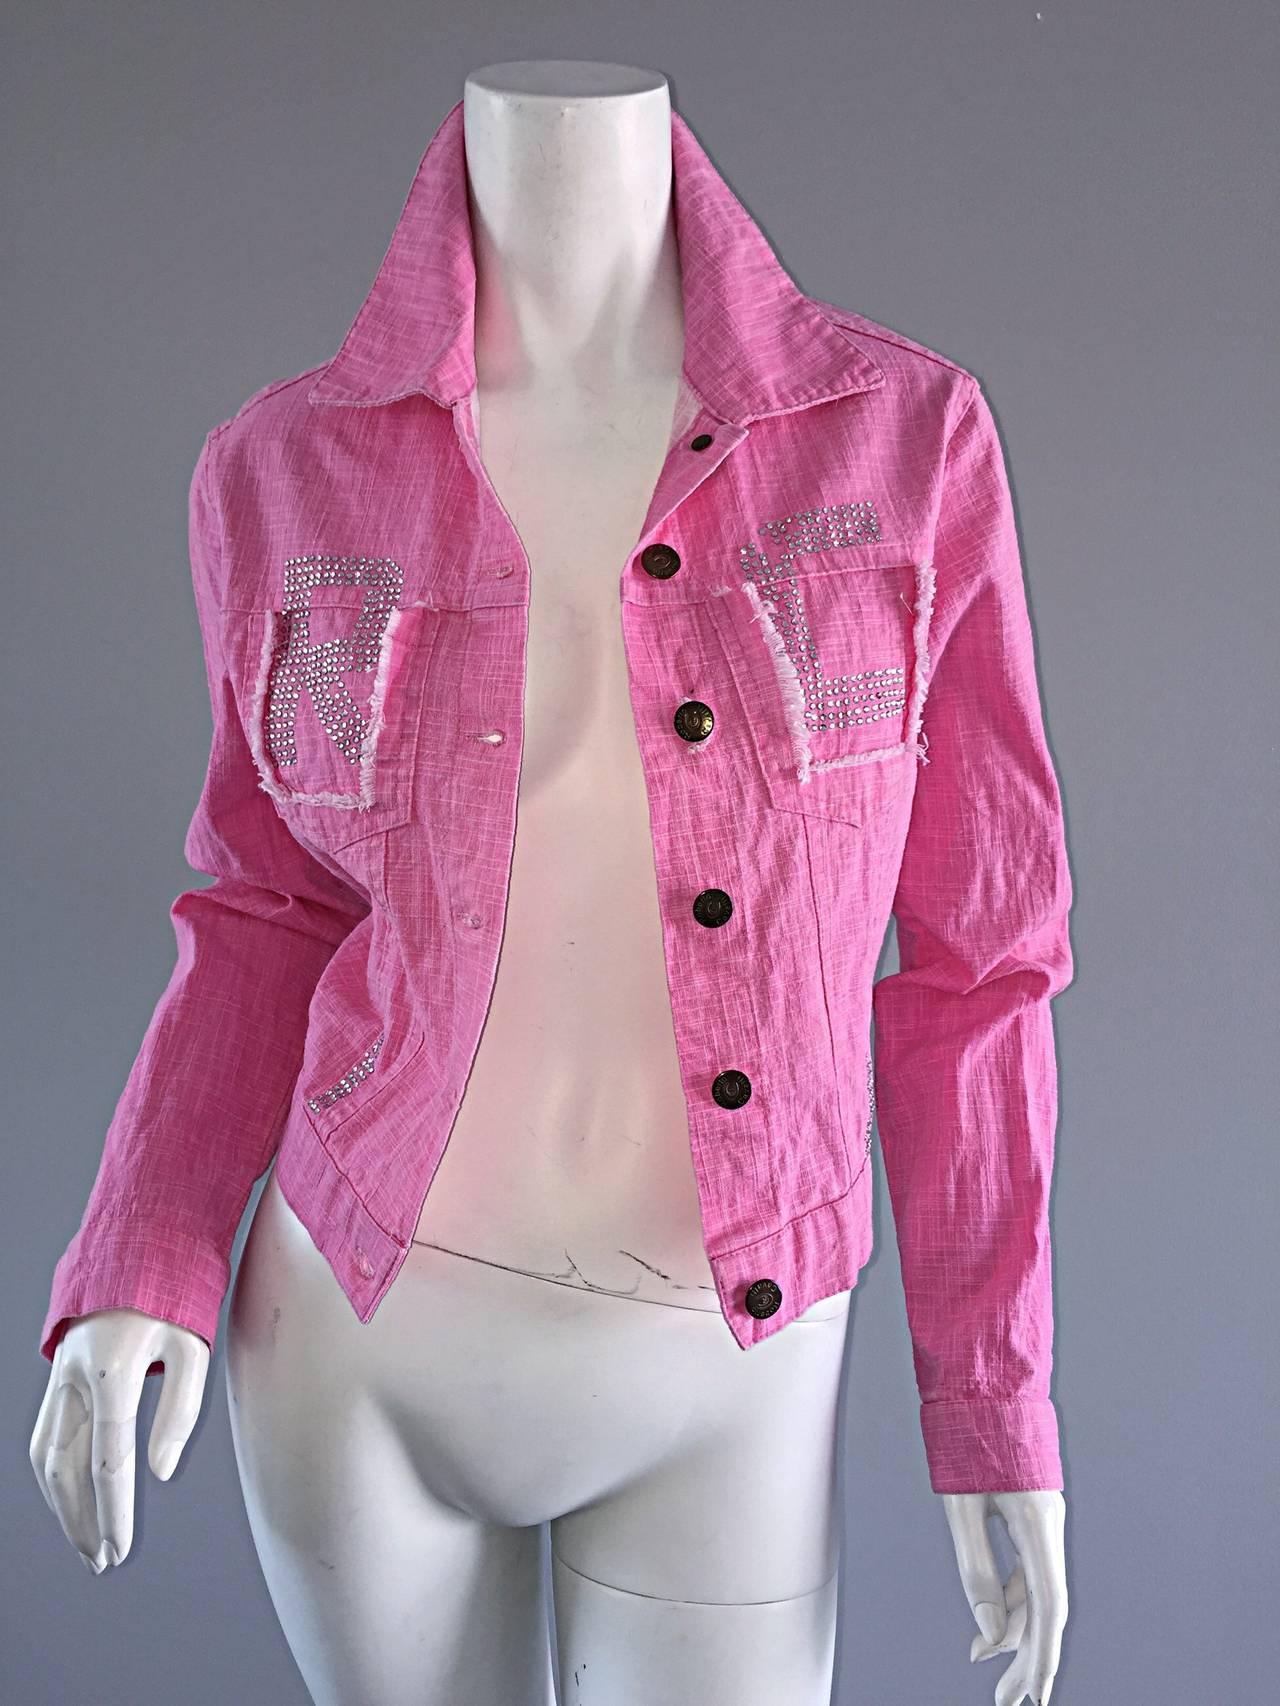 1990s Vintage Roberto Cavalli Pink Denim Jean Jacket + ' R C ' Rhinestones 5